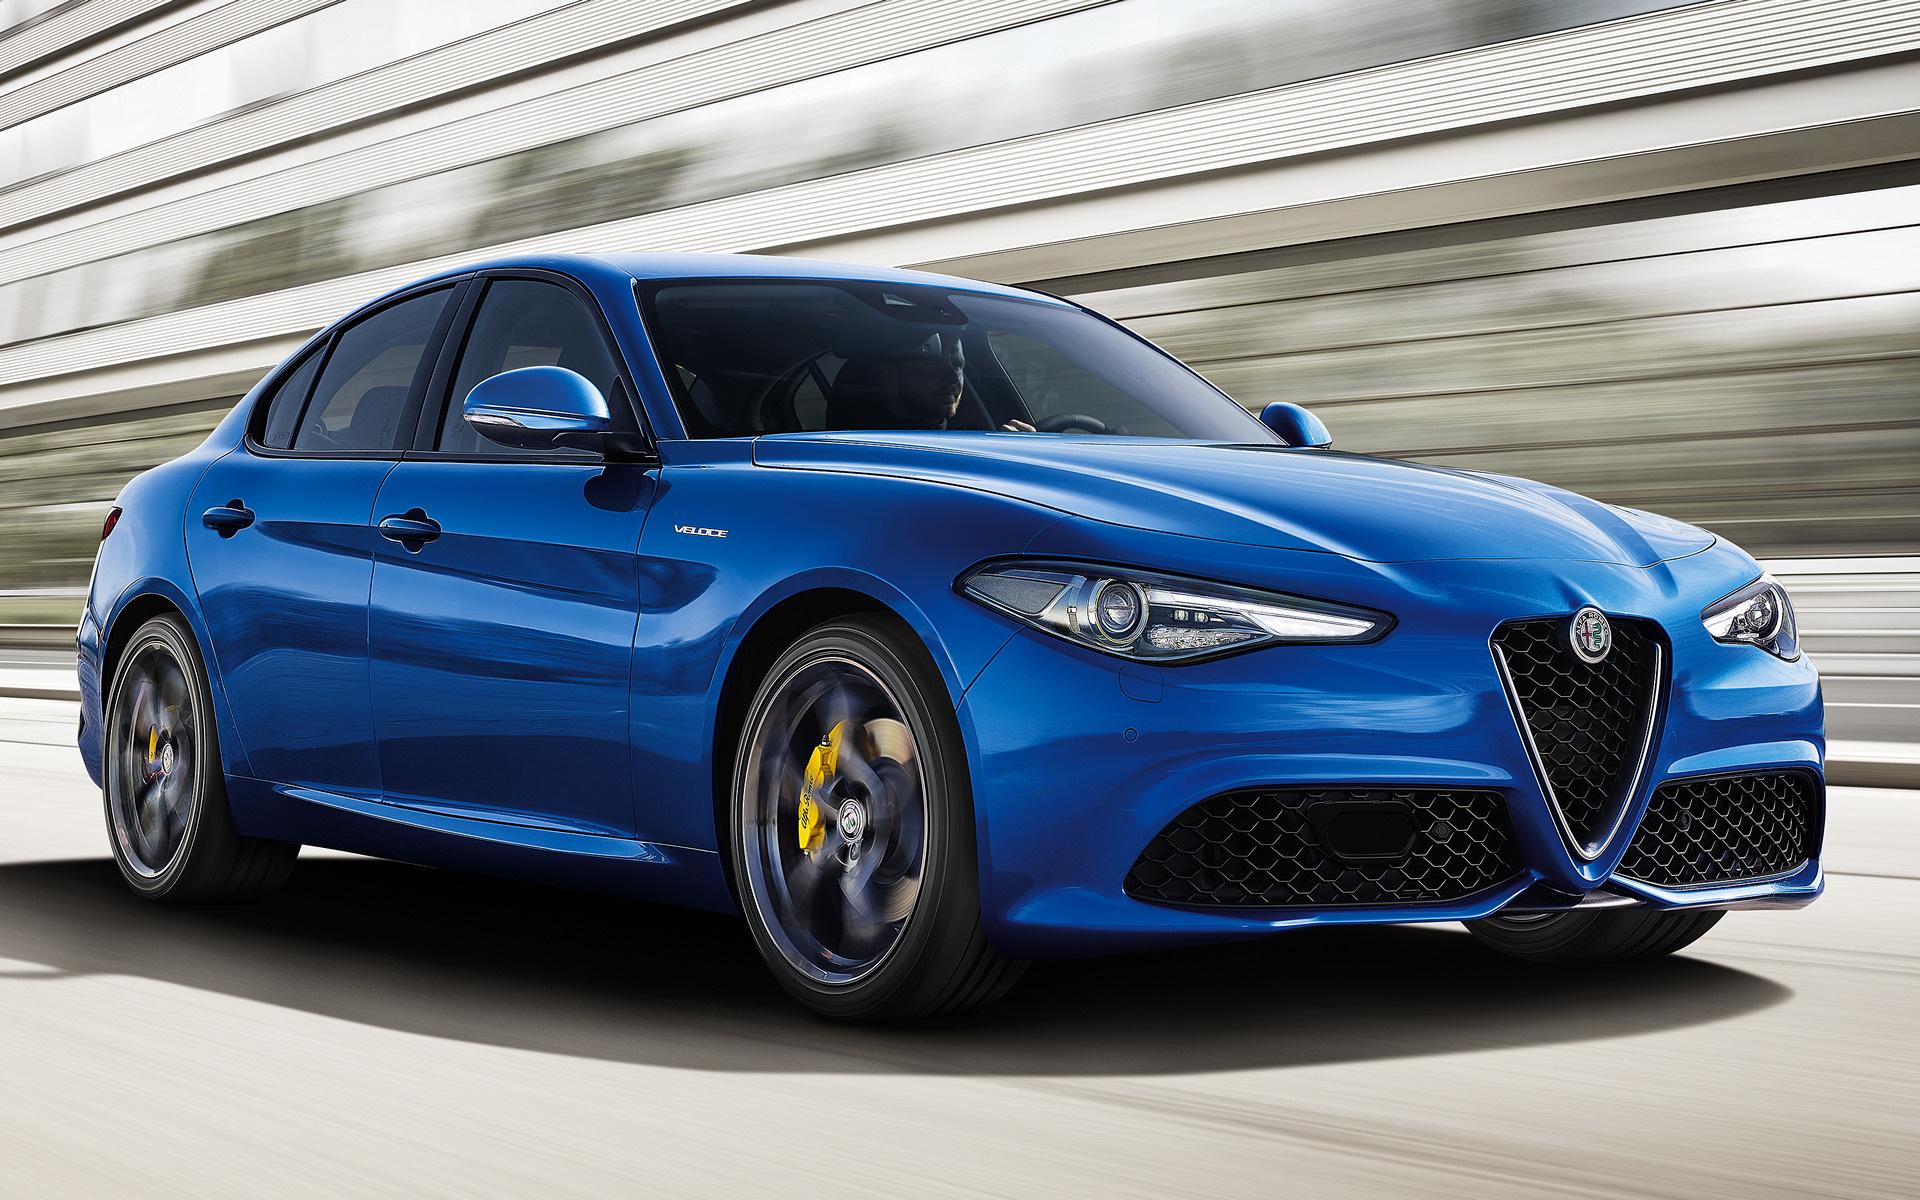 2020 Dodge Ram >> 2016 Alfa Romeo Giulia Veloce - Wallpapers and HD Images ...